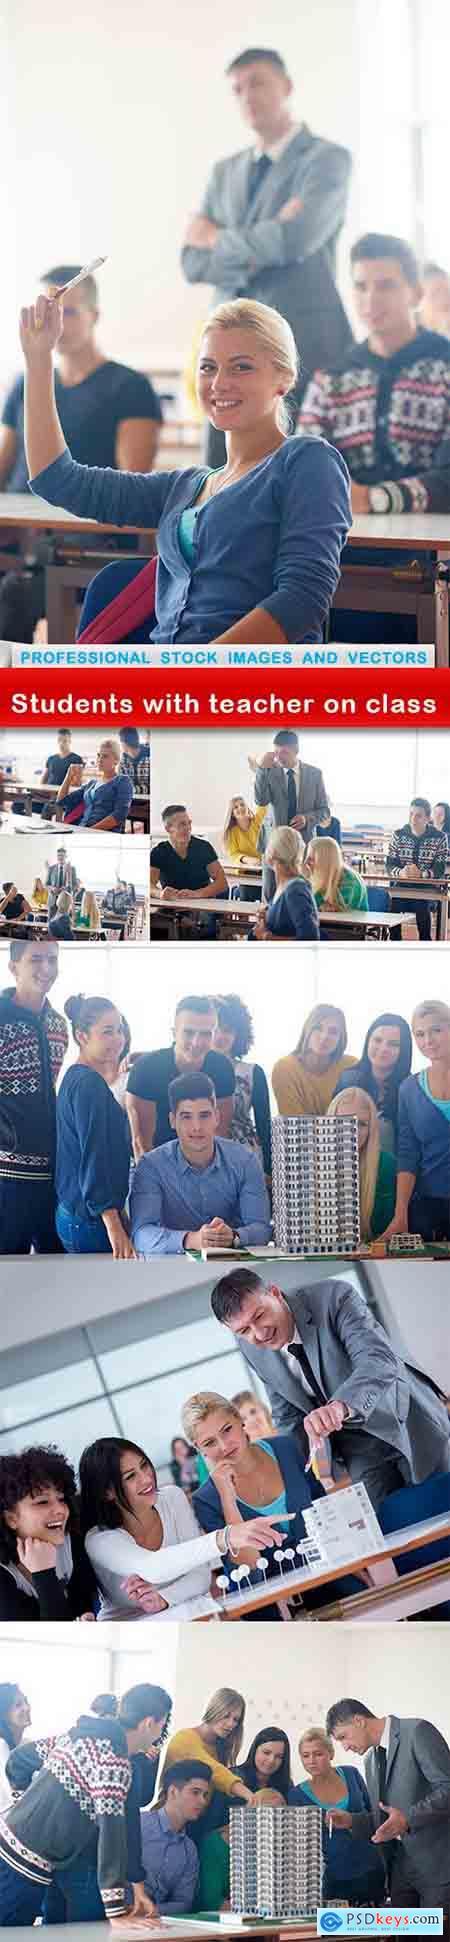 Students with teacher on class - 7 UHQ JPEG